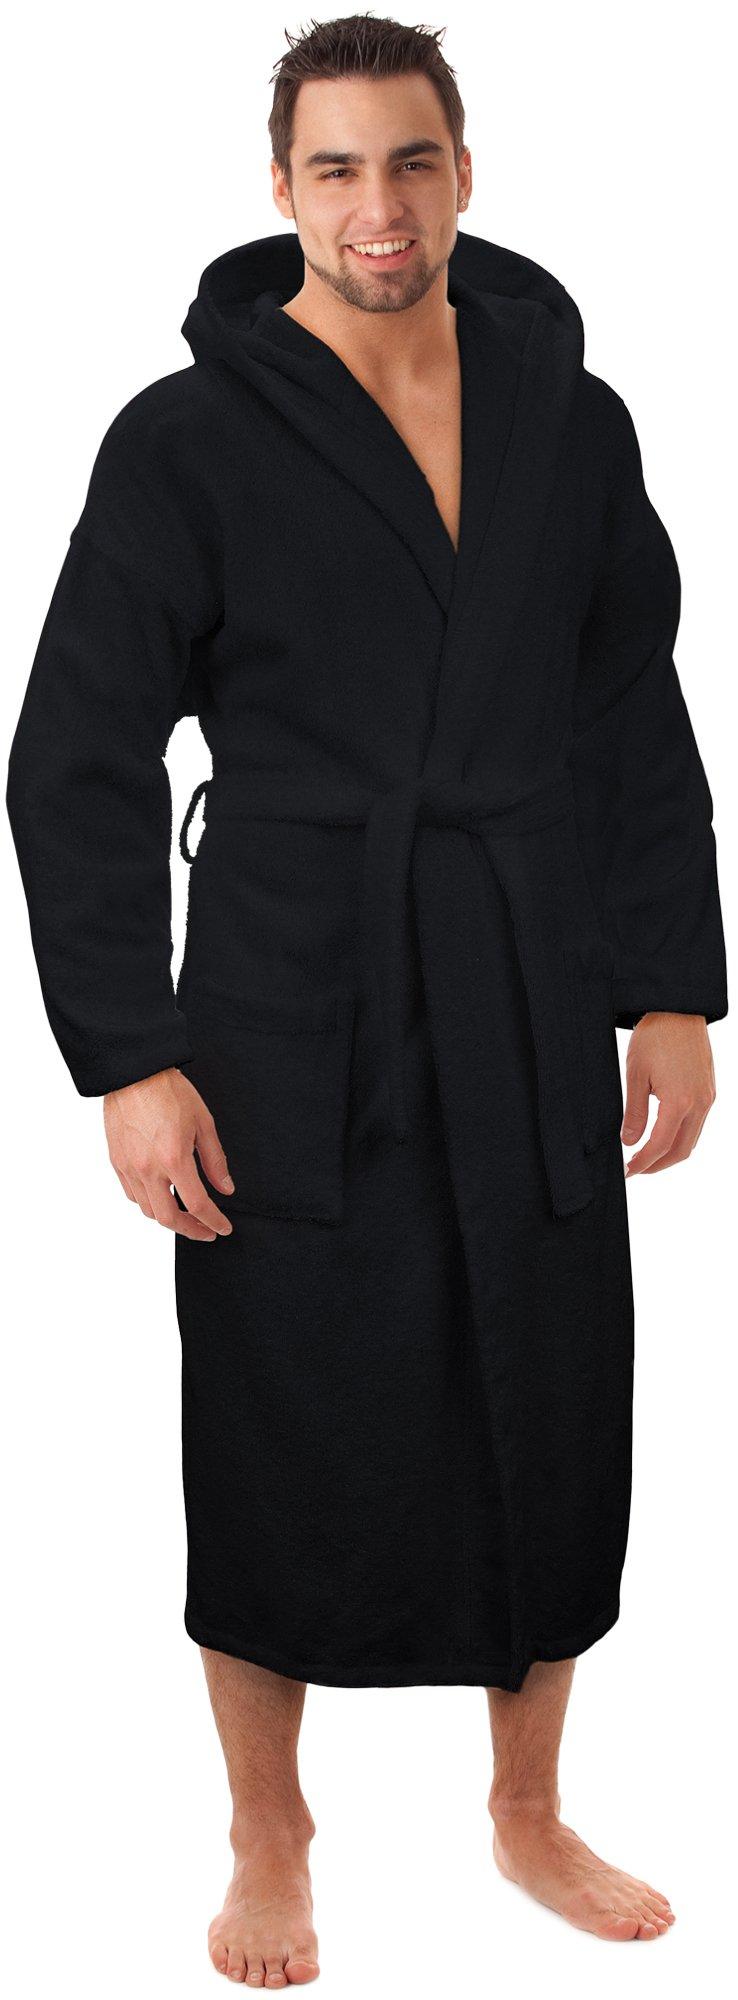 Hooded Terry Bathrobe Made in Turkey,Black-S/M